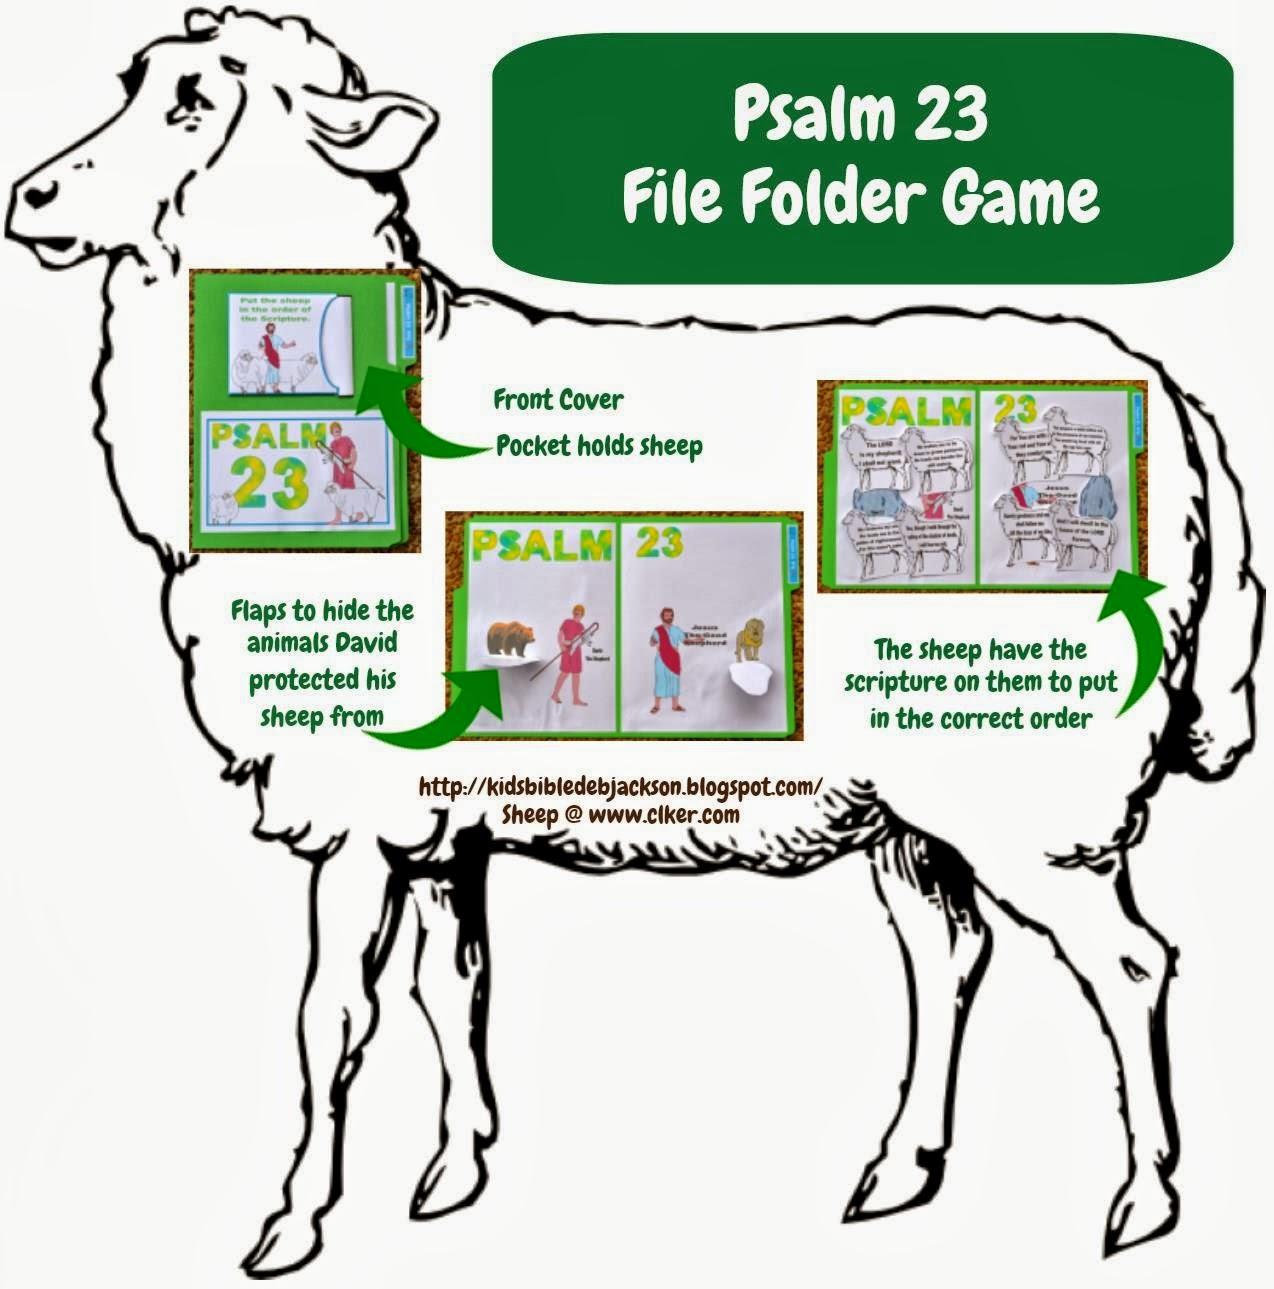 http://kidsbibledebjackson.blogspot.com/2014/01/psalm-23-by-david-shepherd.html